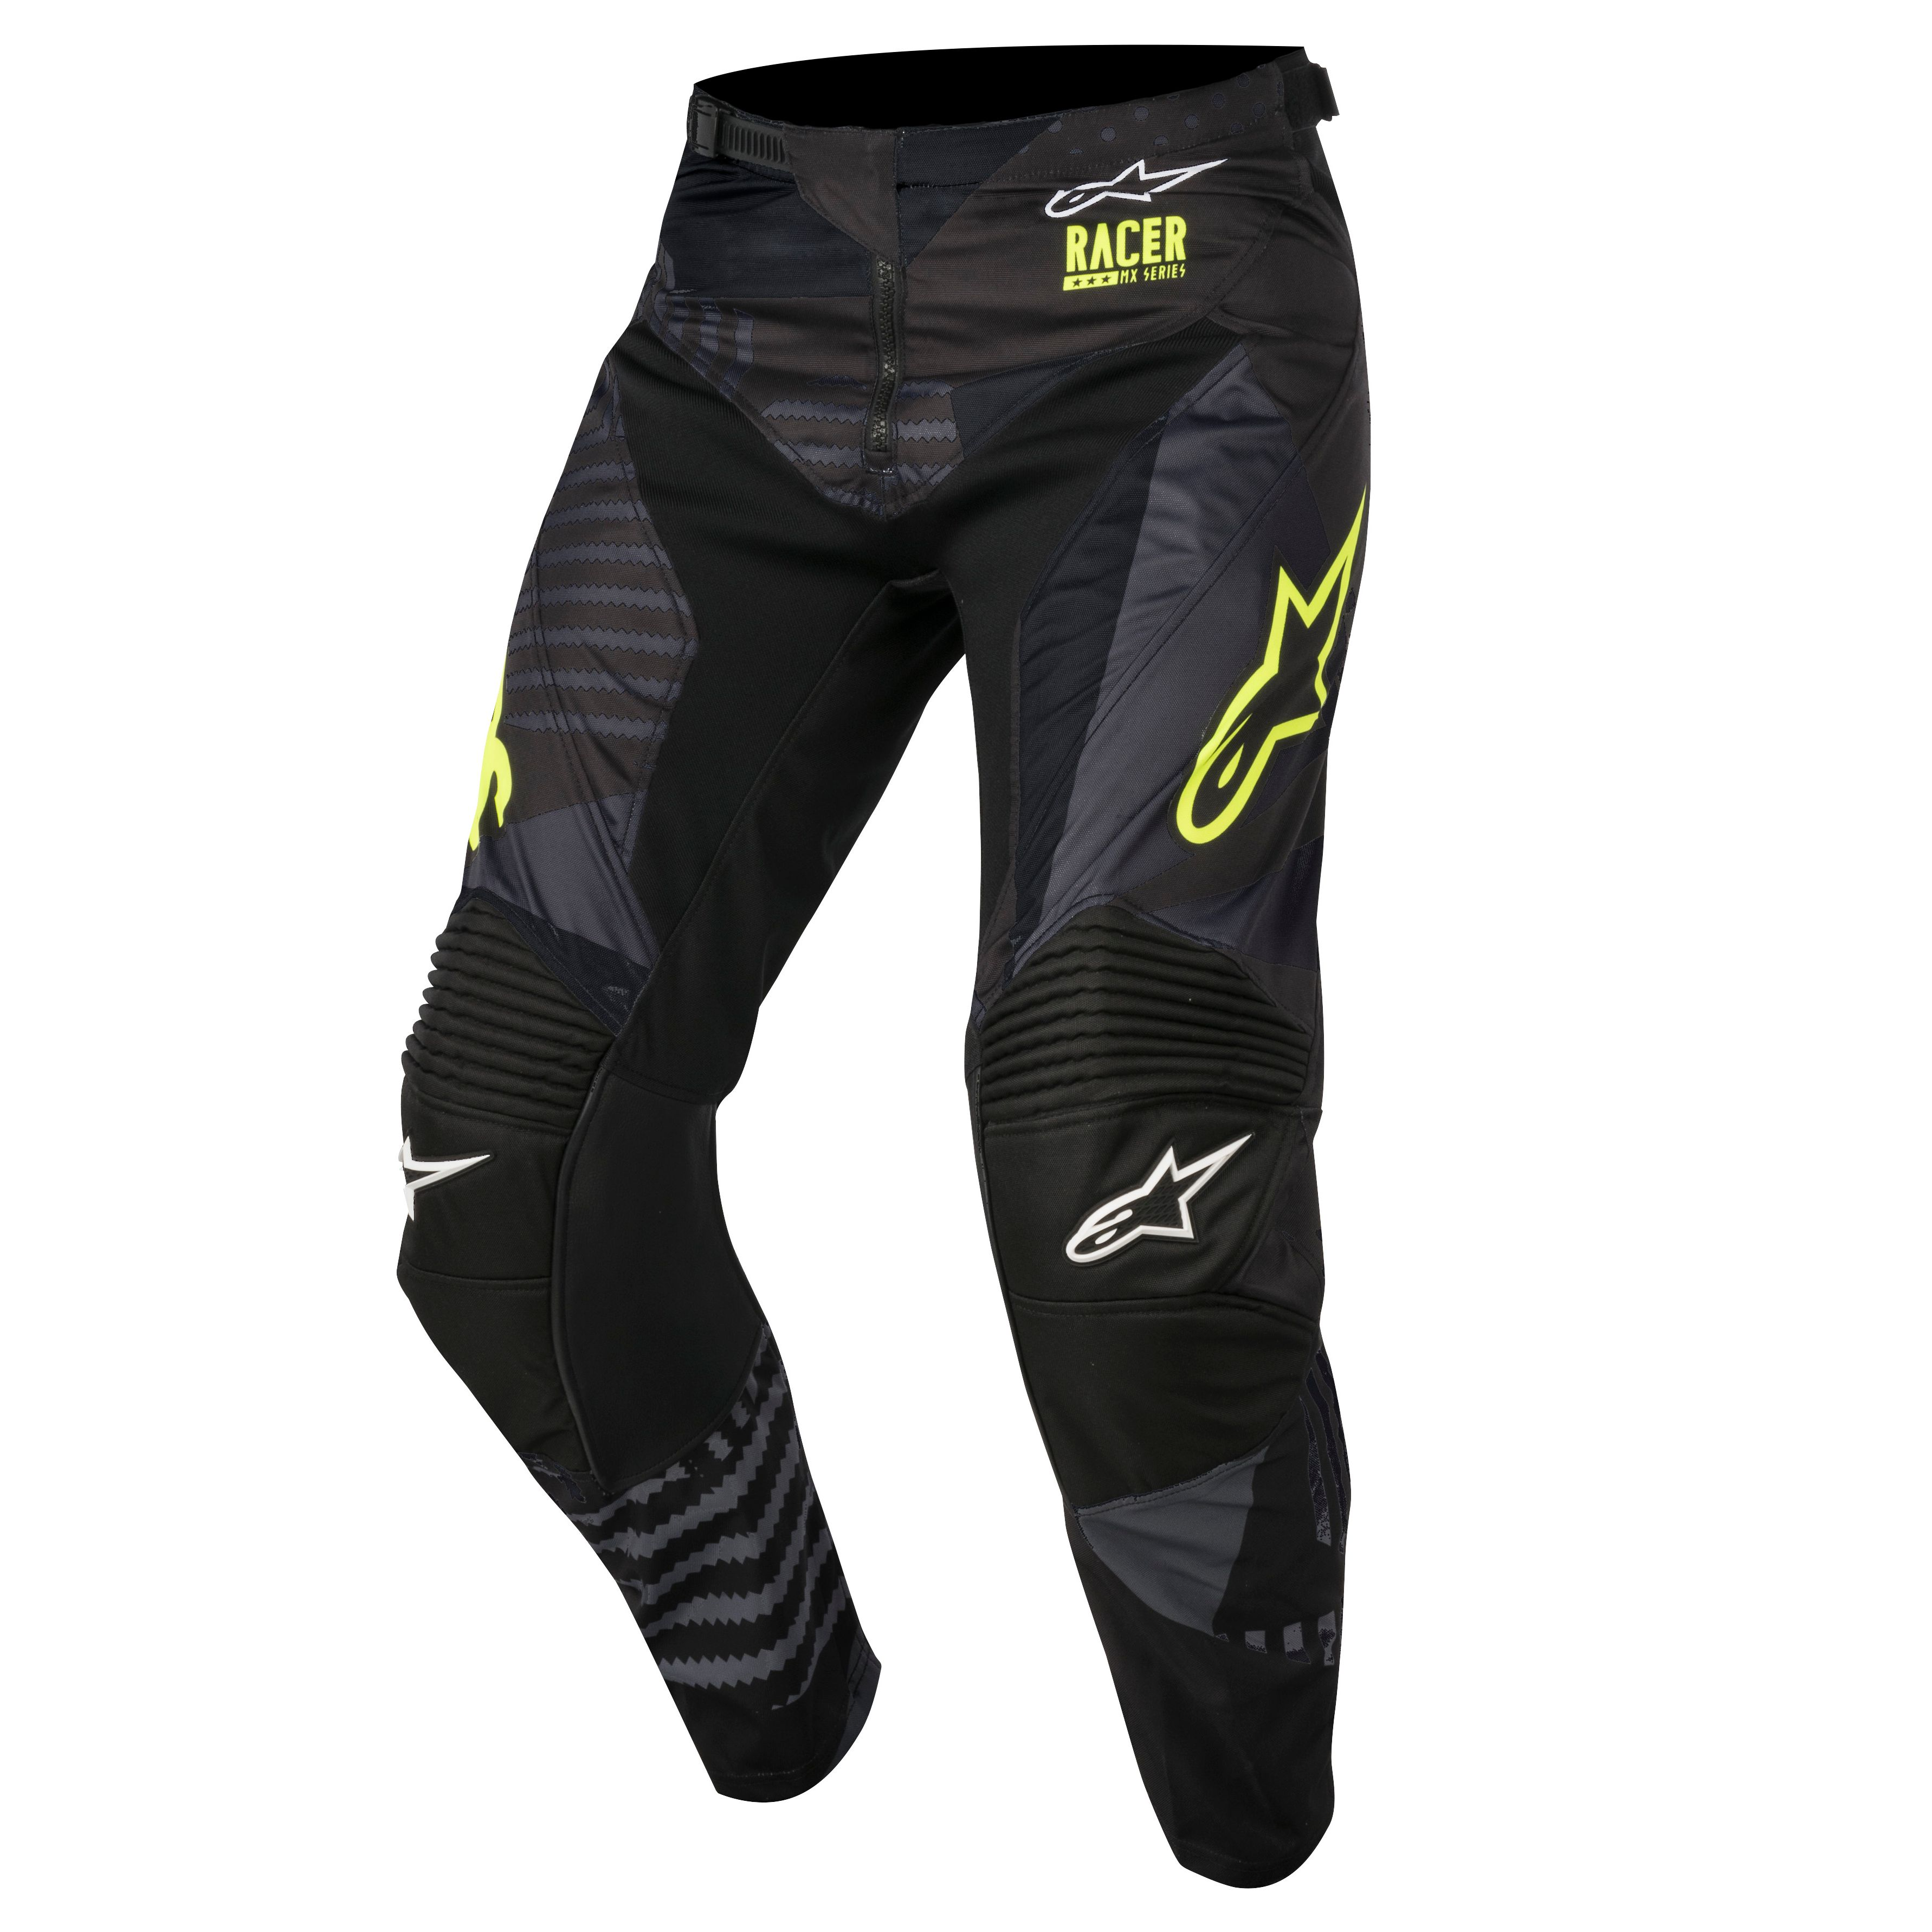 Pantalon De Motocross Alpinestars Racer Tactical Negro Amarillo Fluor 2018 Motoblouz Es